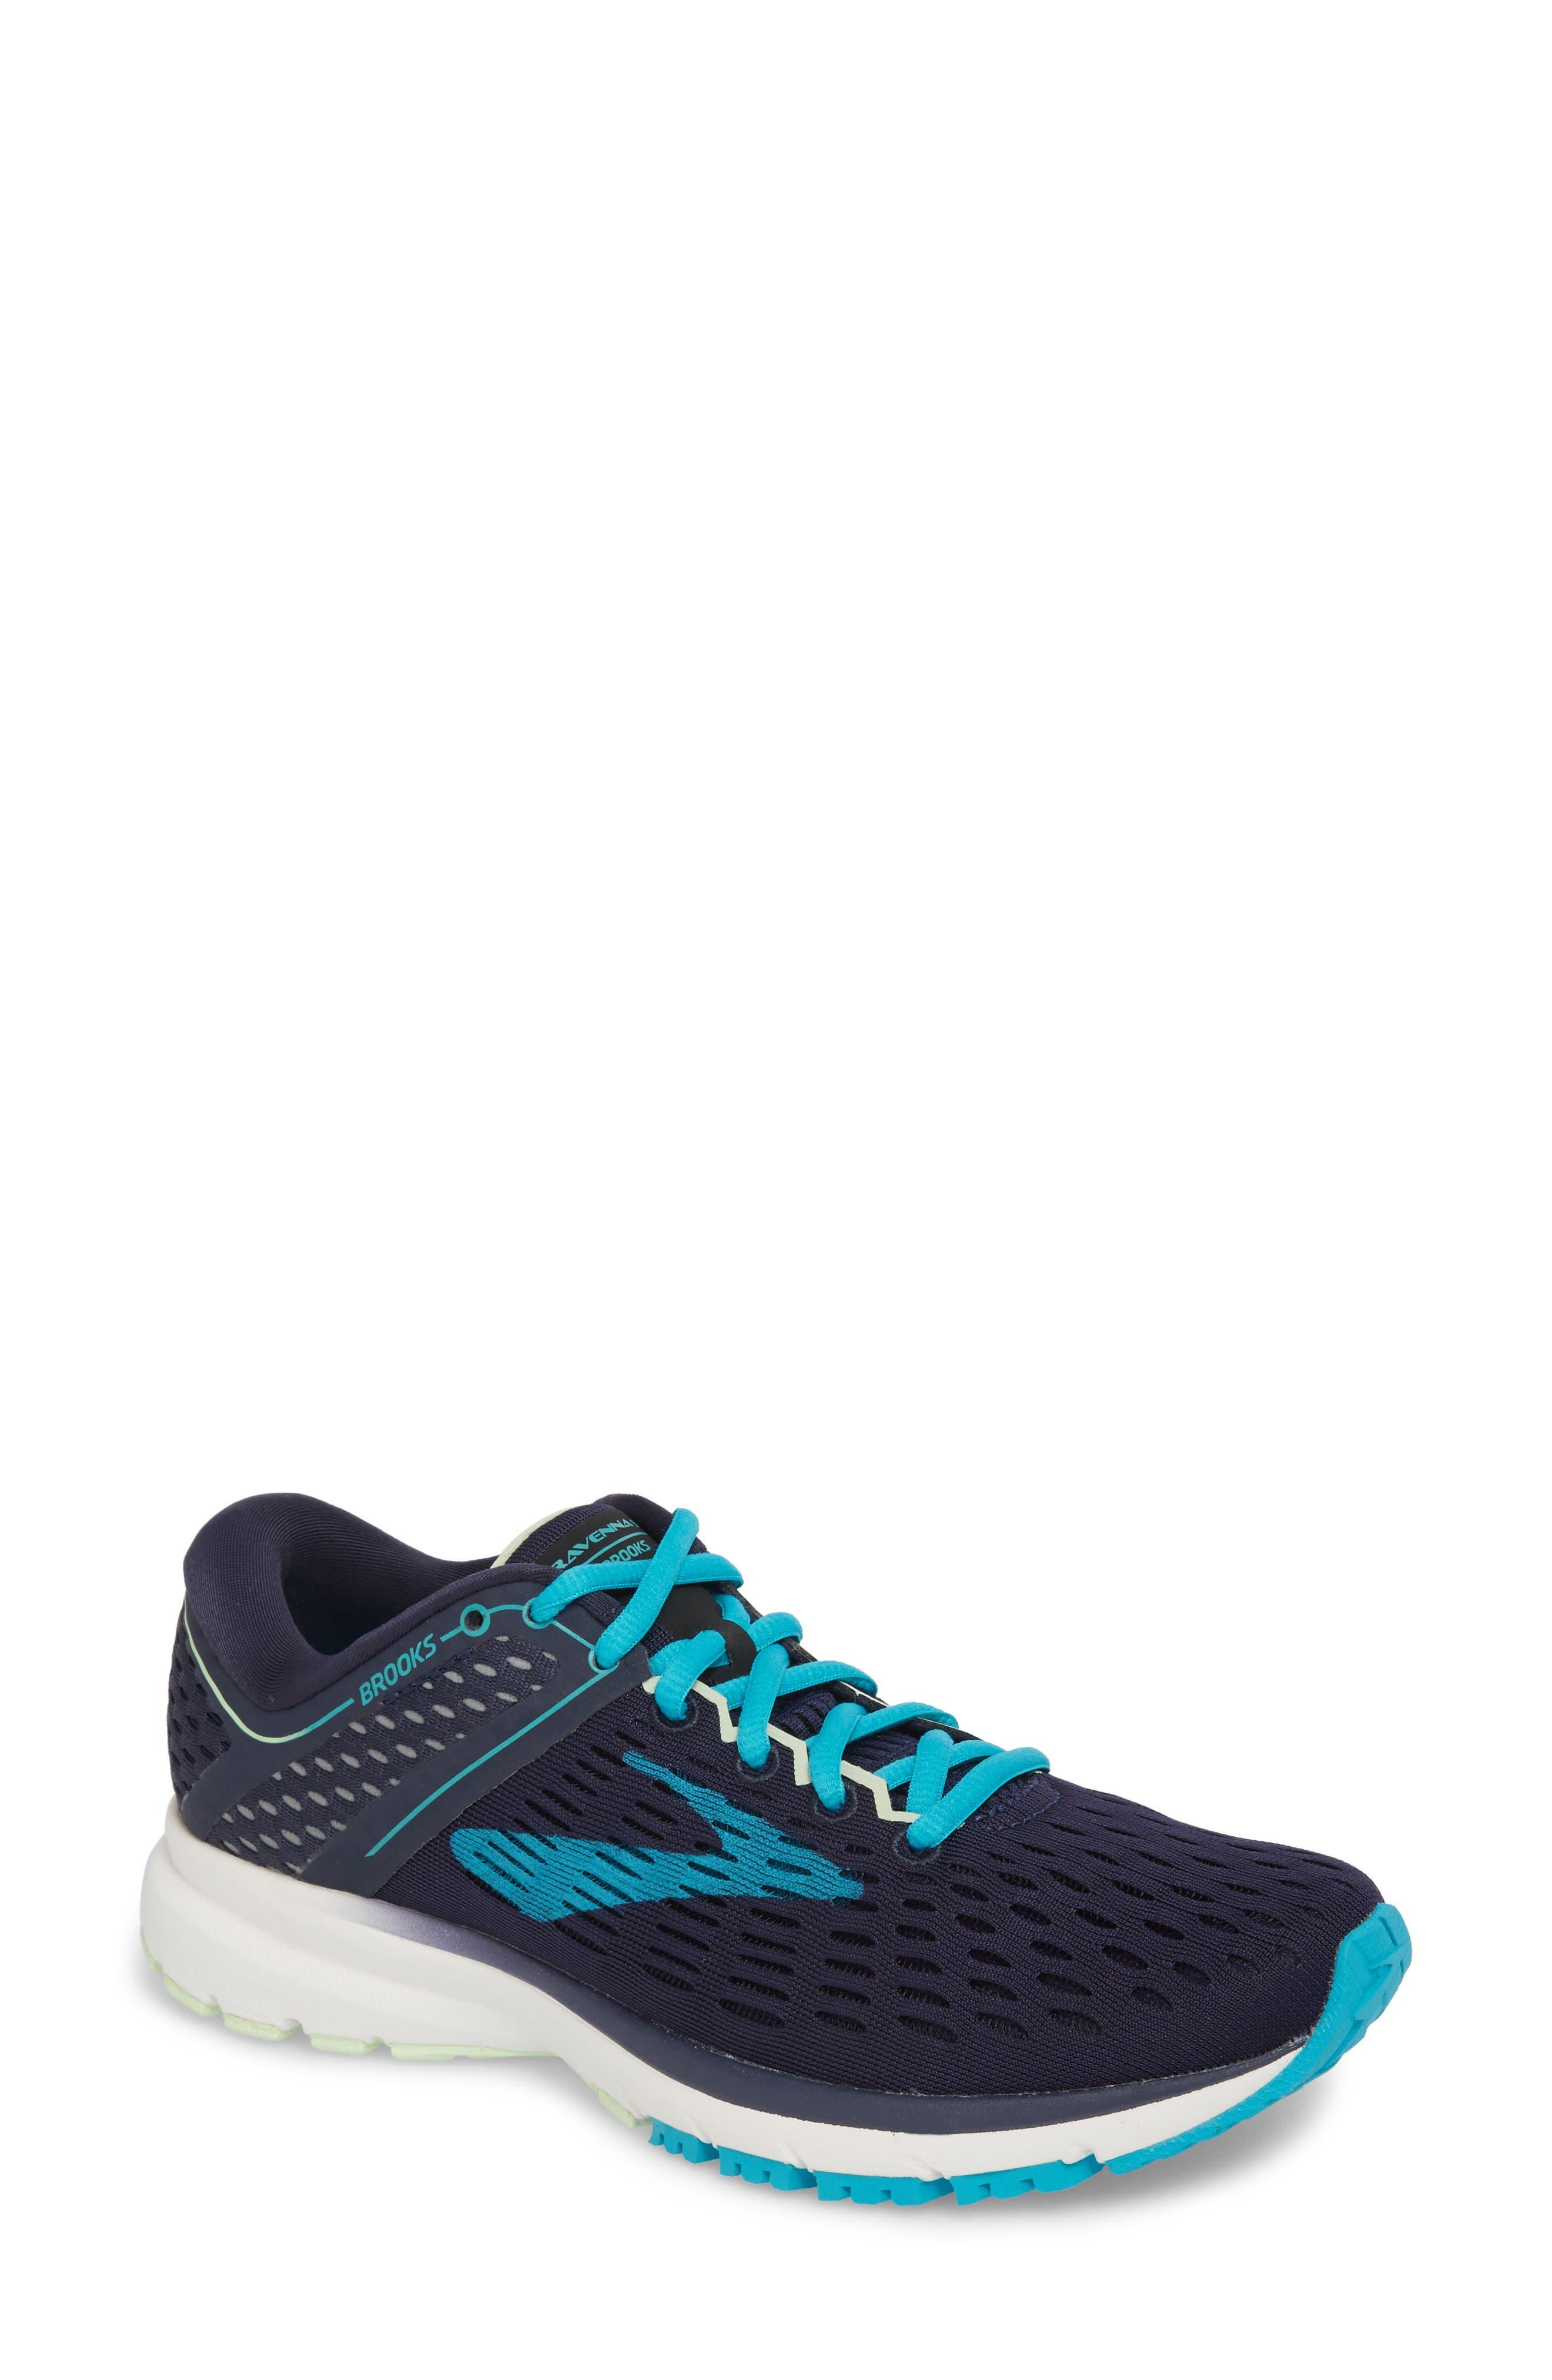 Ravenna 9 Running Shoe, Main, color, NAVY/ BLUE/ GREEN